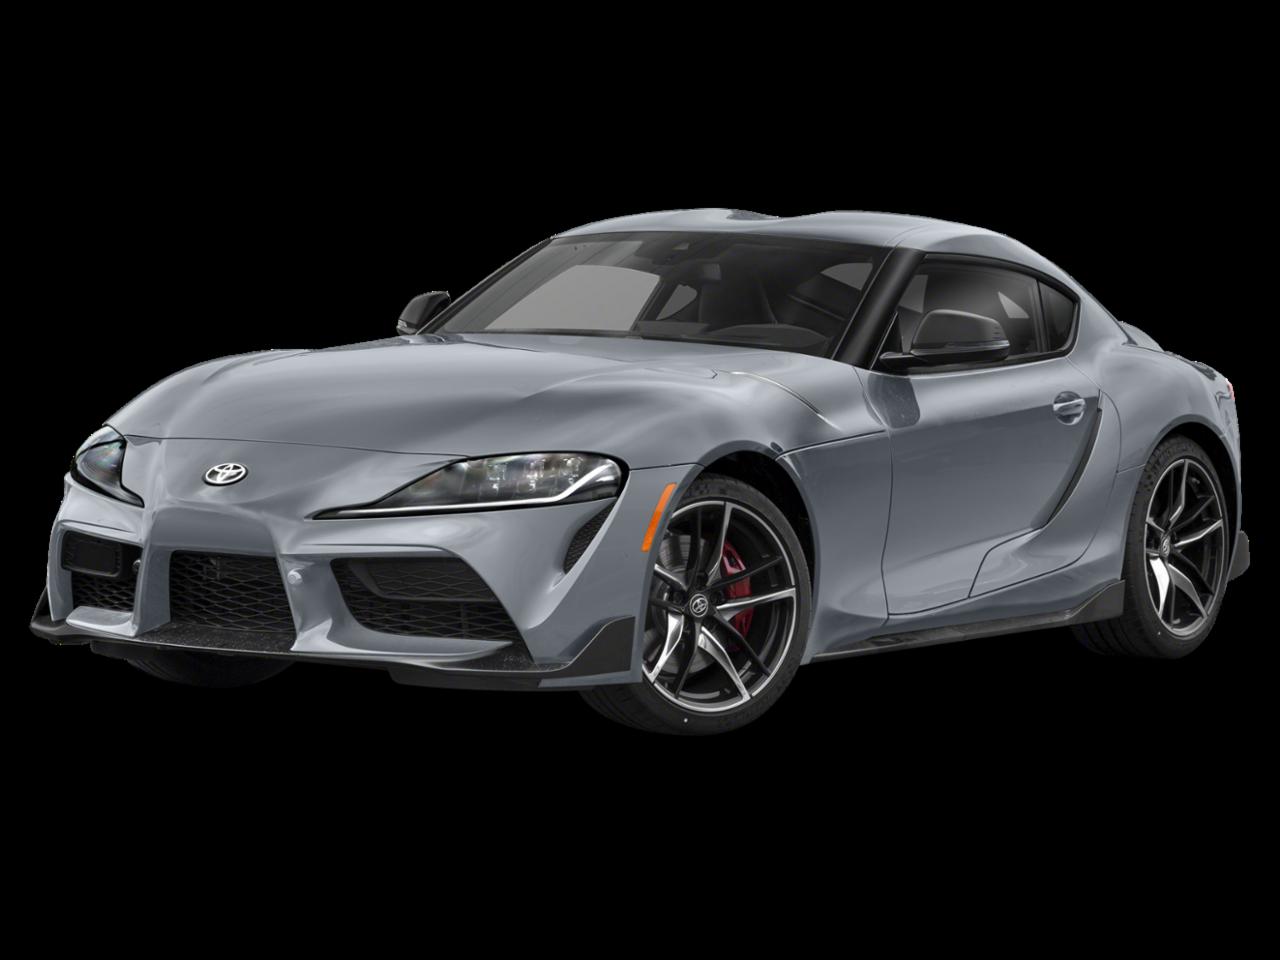 Toyota 2020 GR Supra 3.0